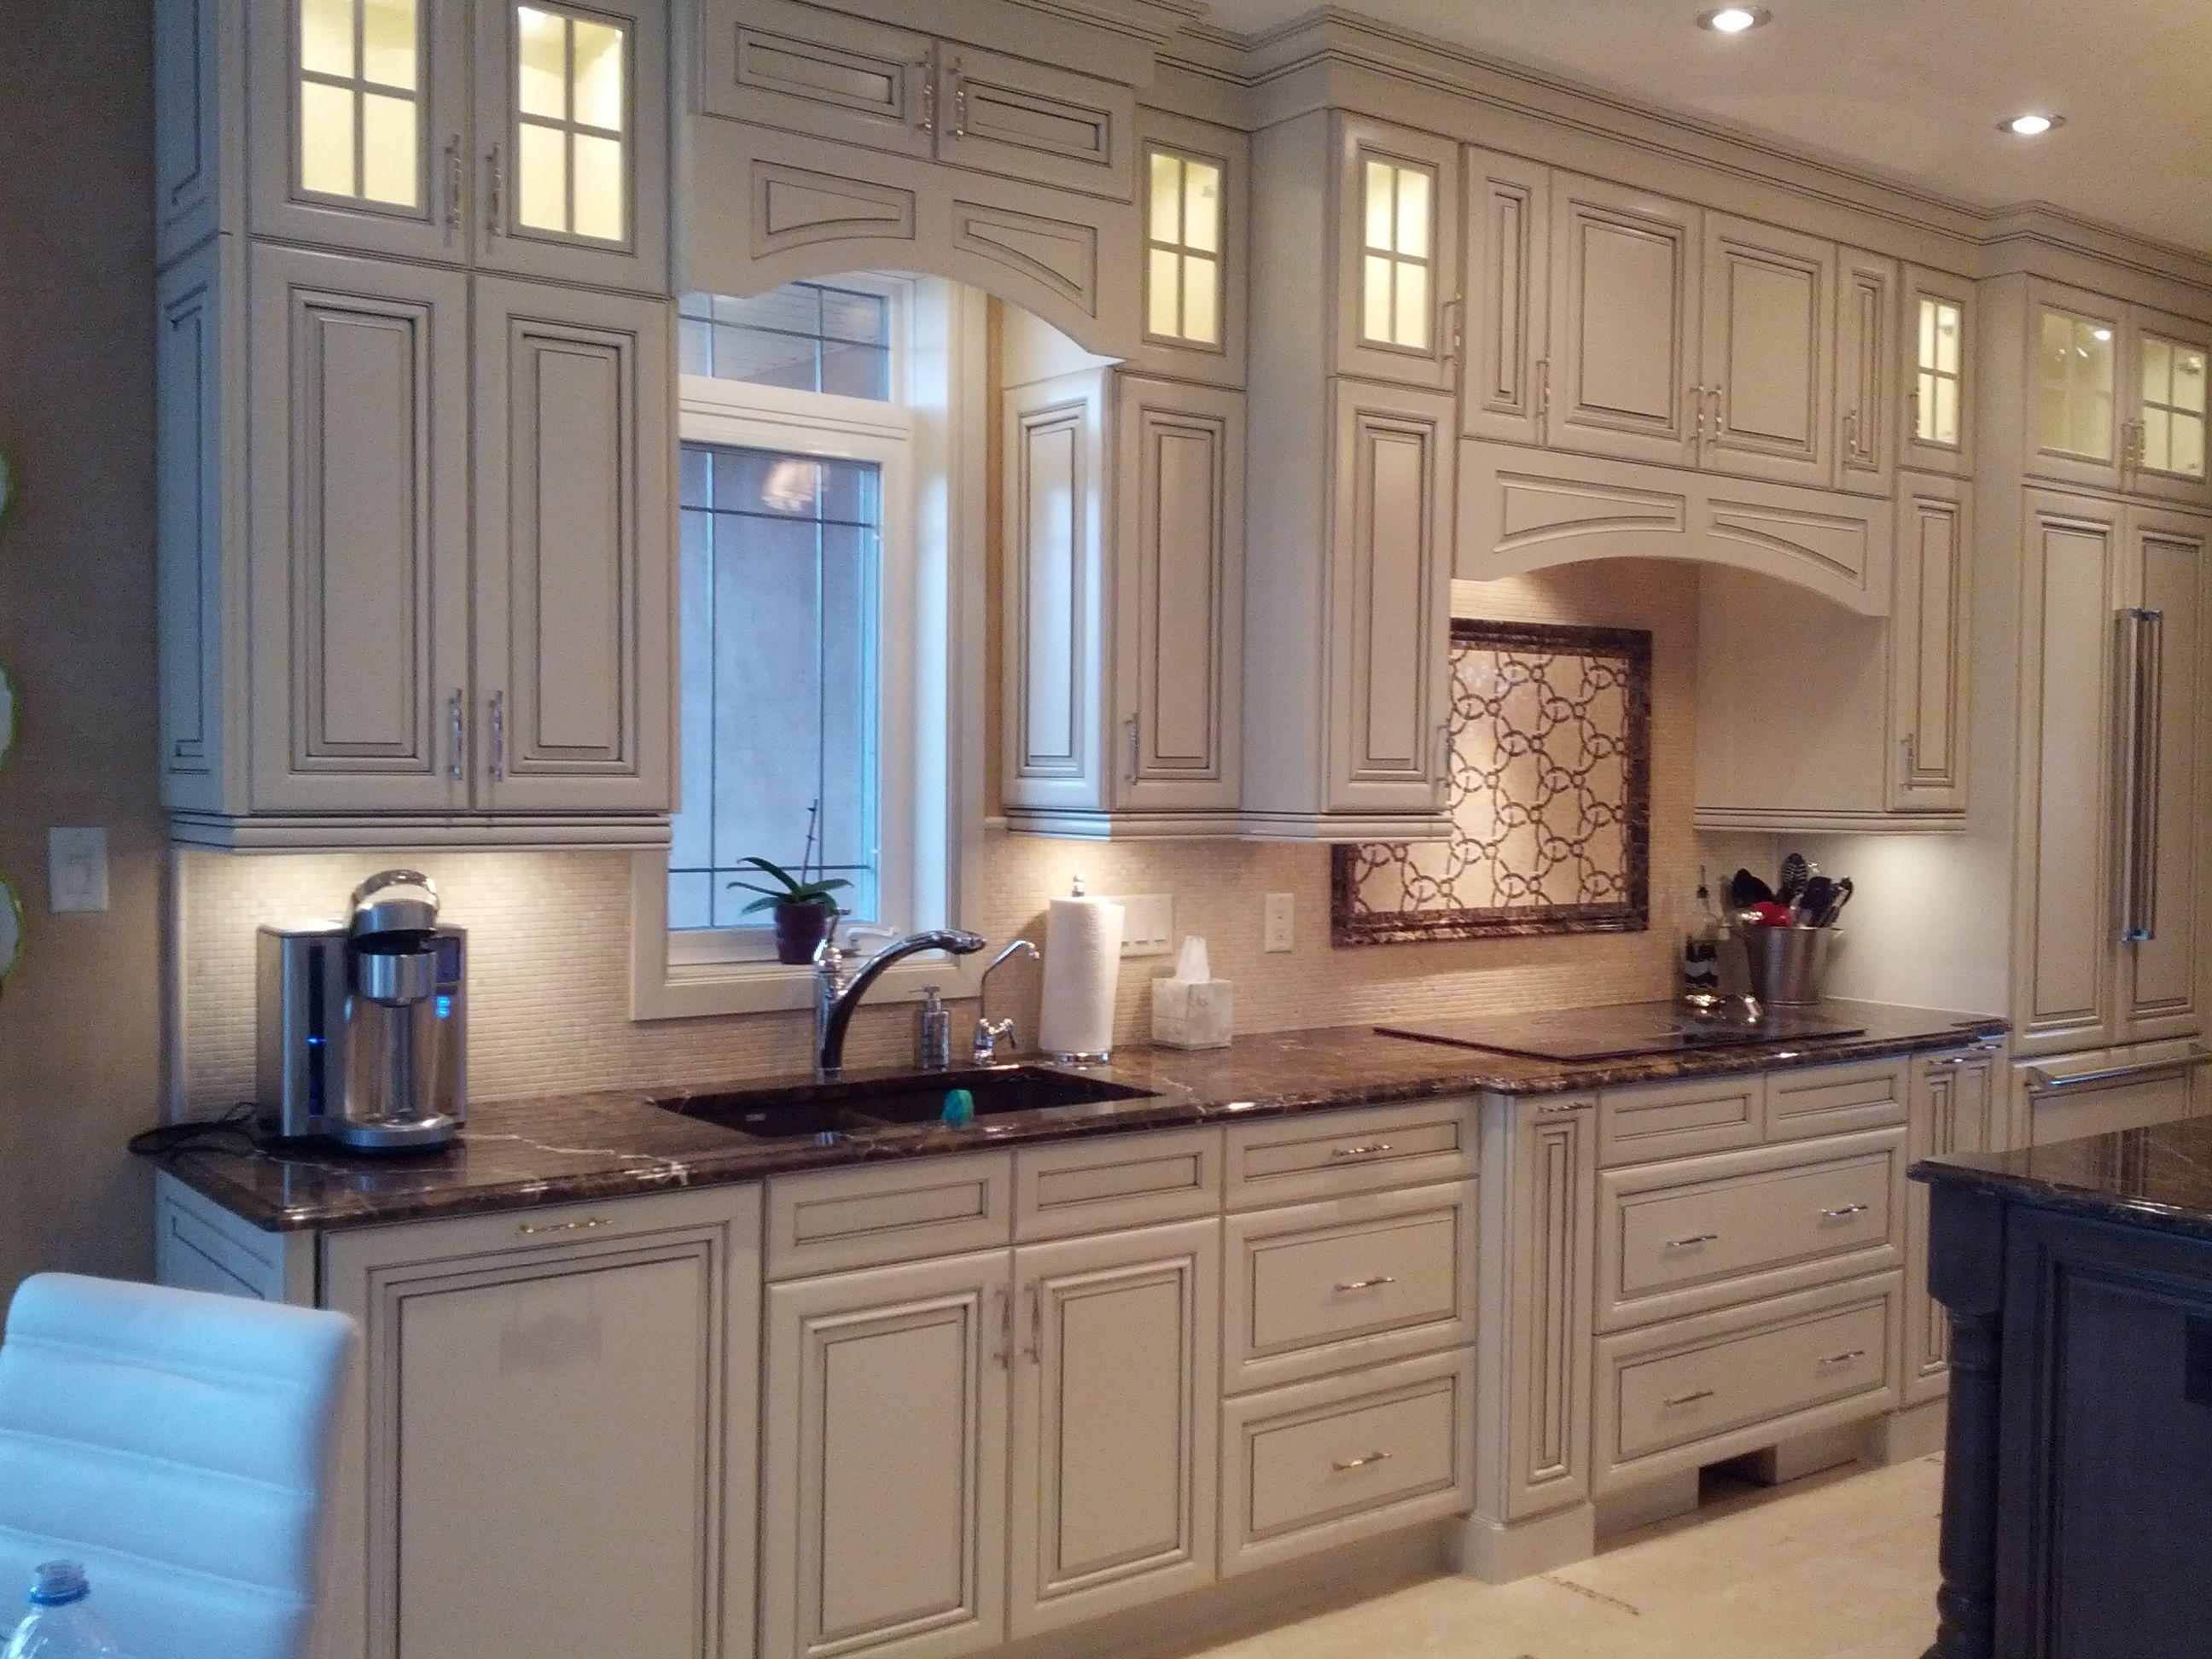 my kitchen designs kitchen craft cabinets Cabinetry Kitchen Craft Door style Paxson Color Seashell W Smoke Glaze Species